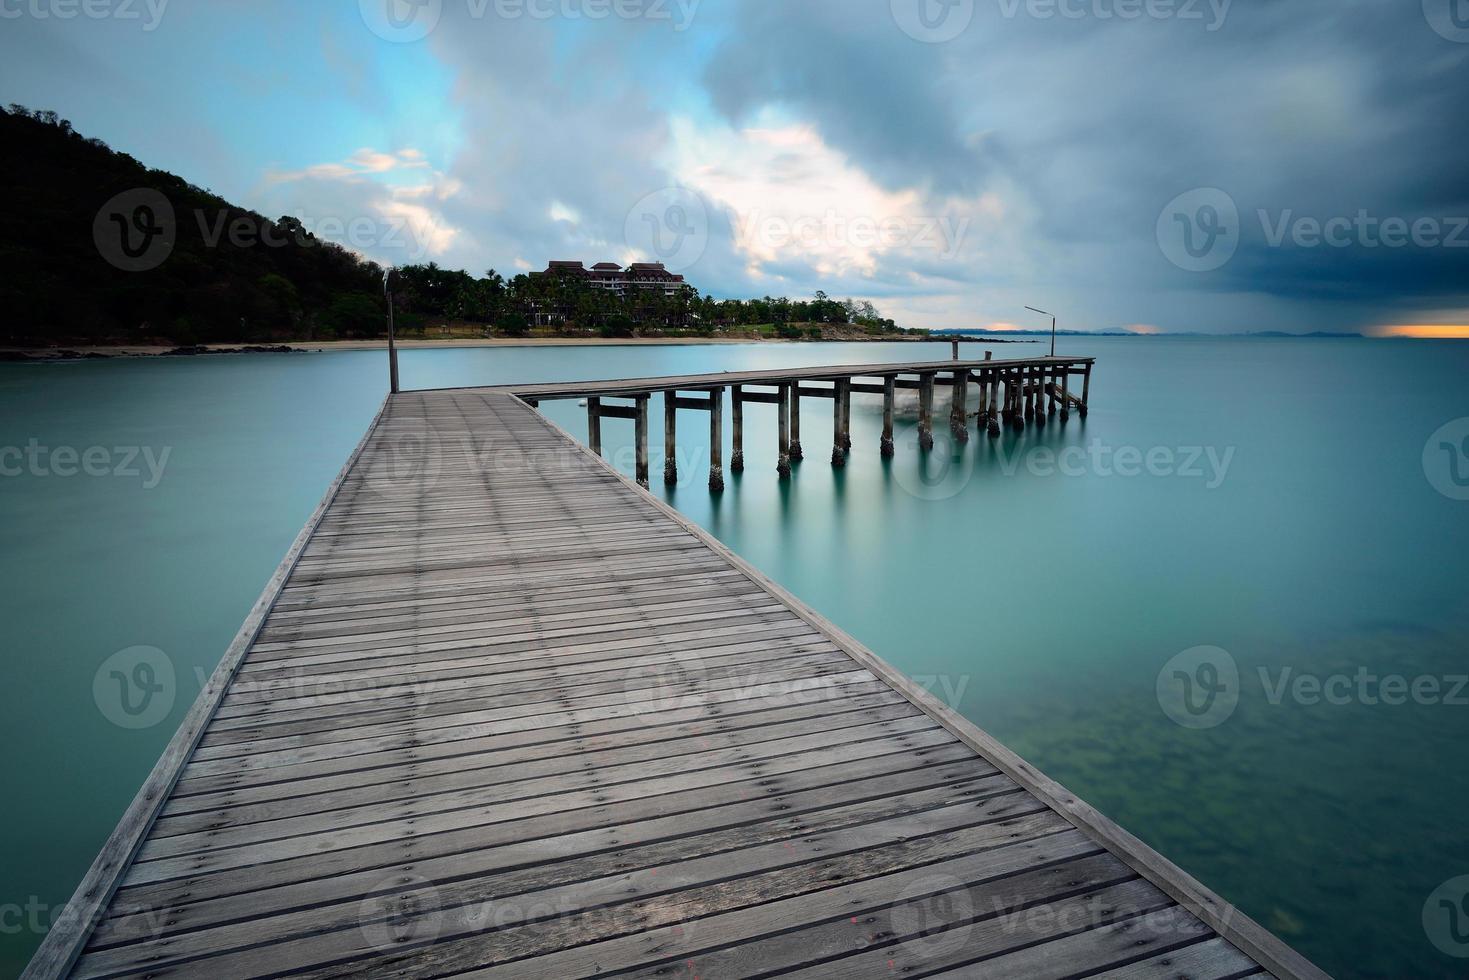 marina foto